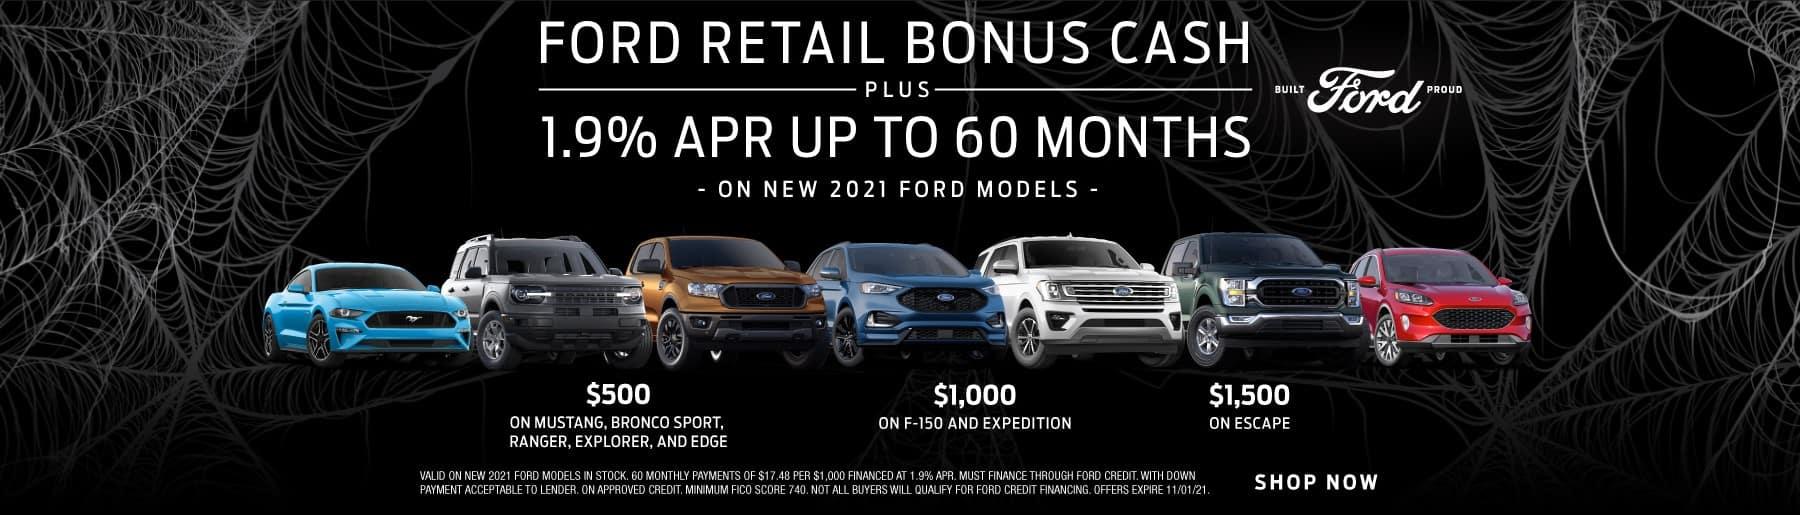 Ford Retail Bonus Cash